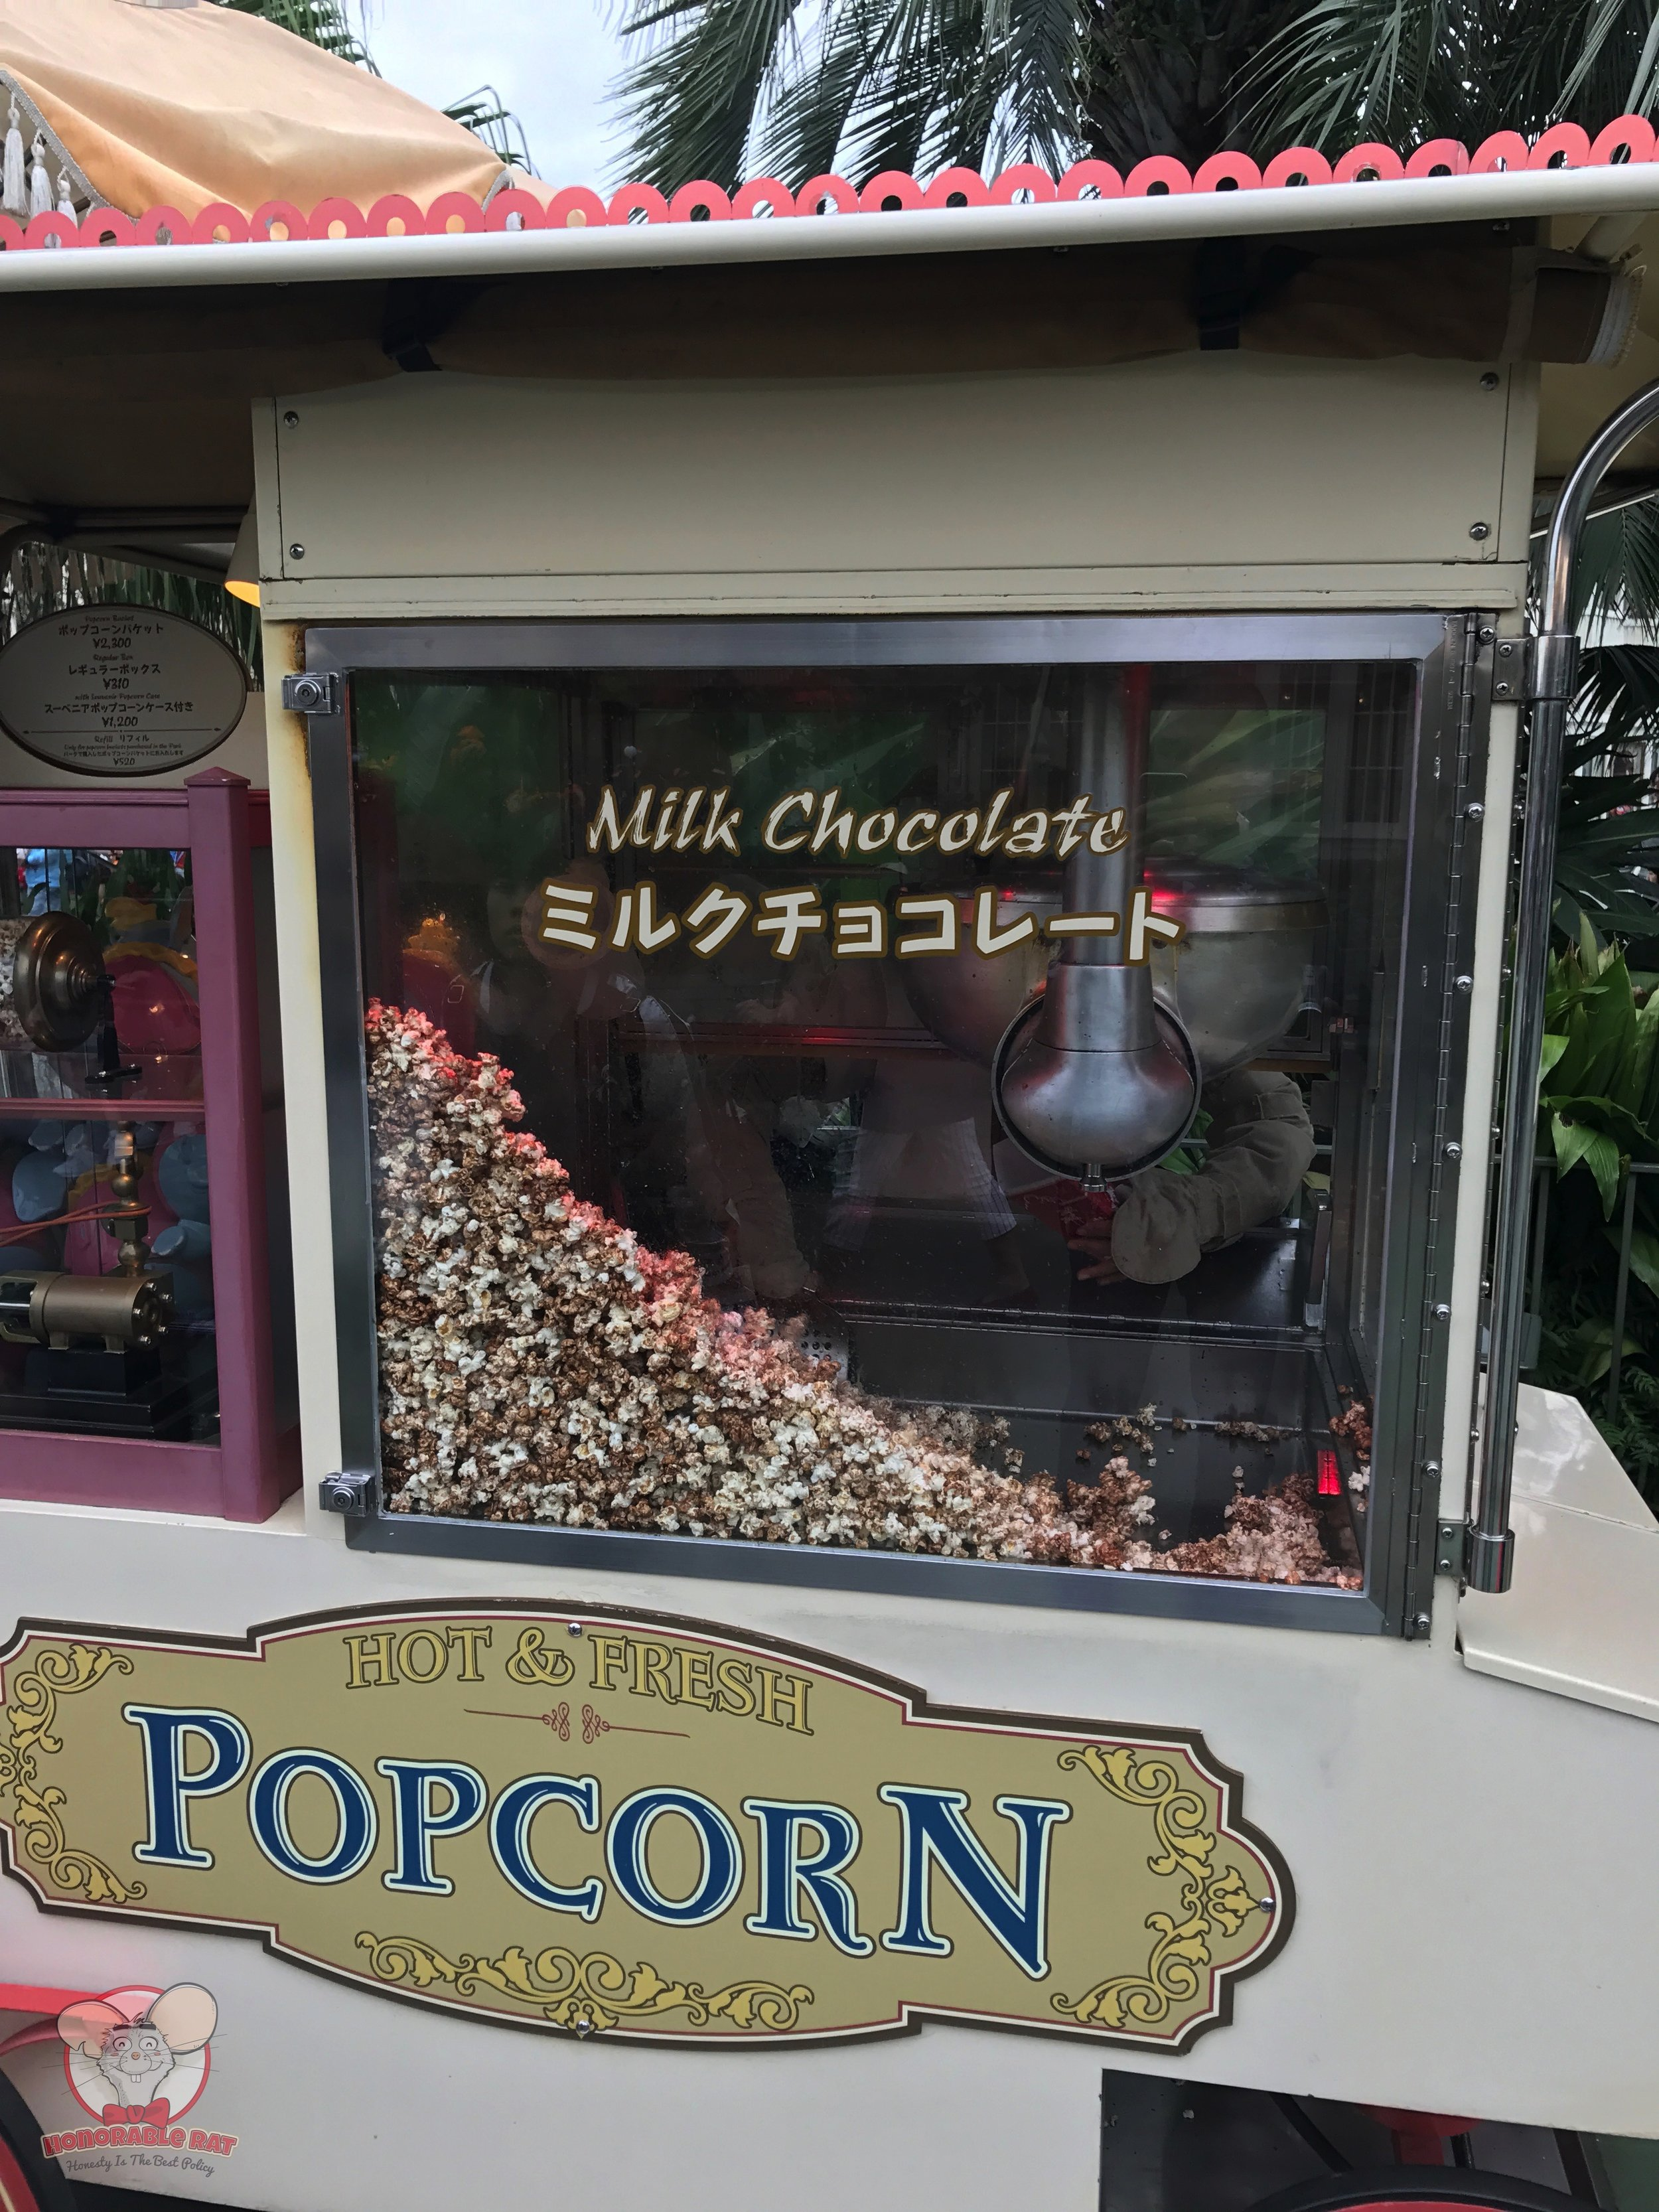 Milk Chocolate popcorn cart